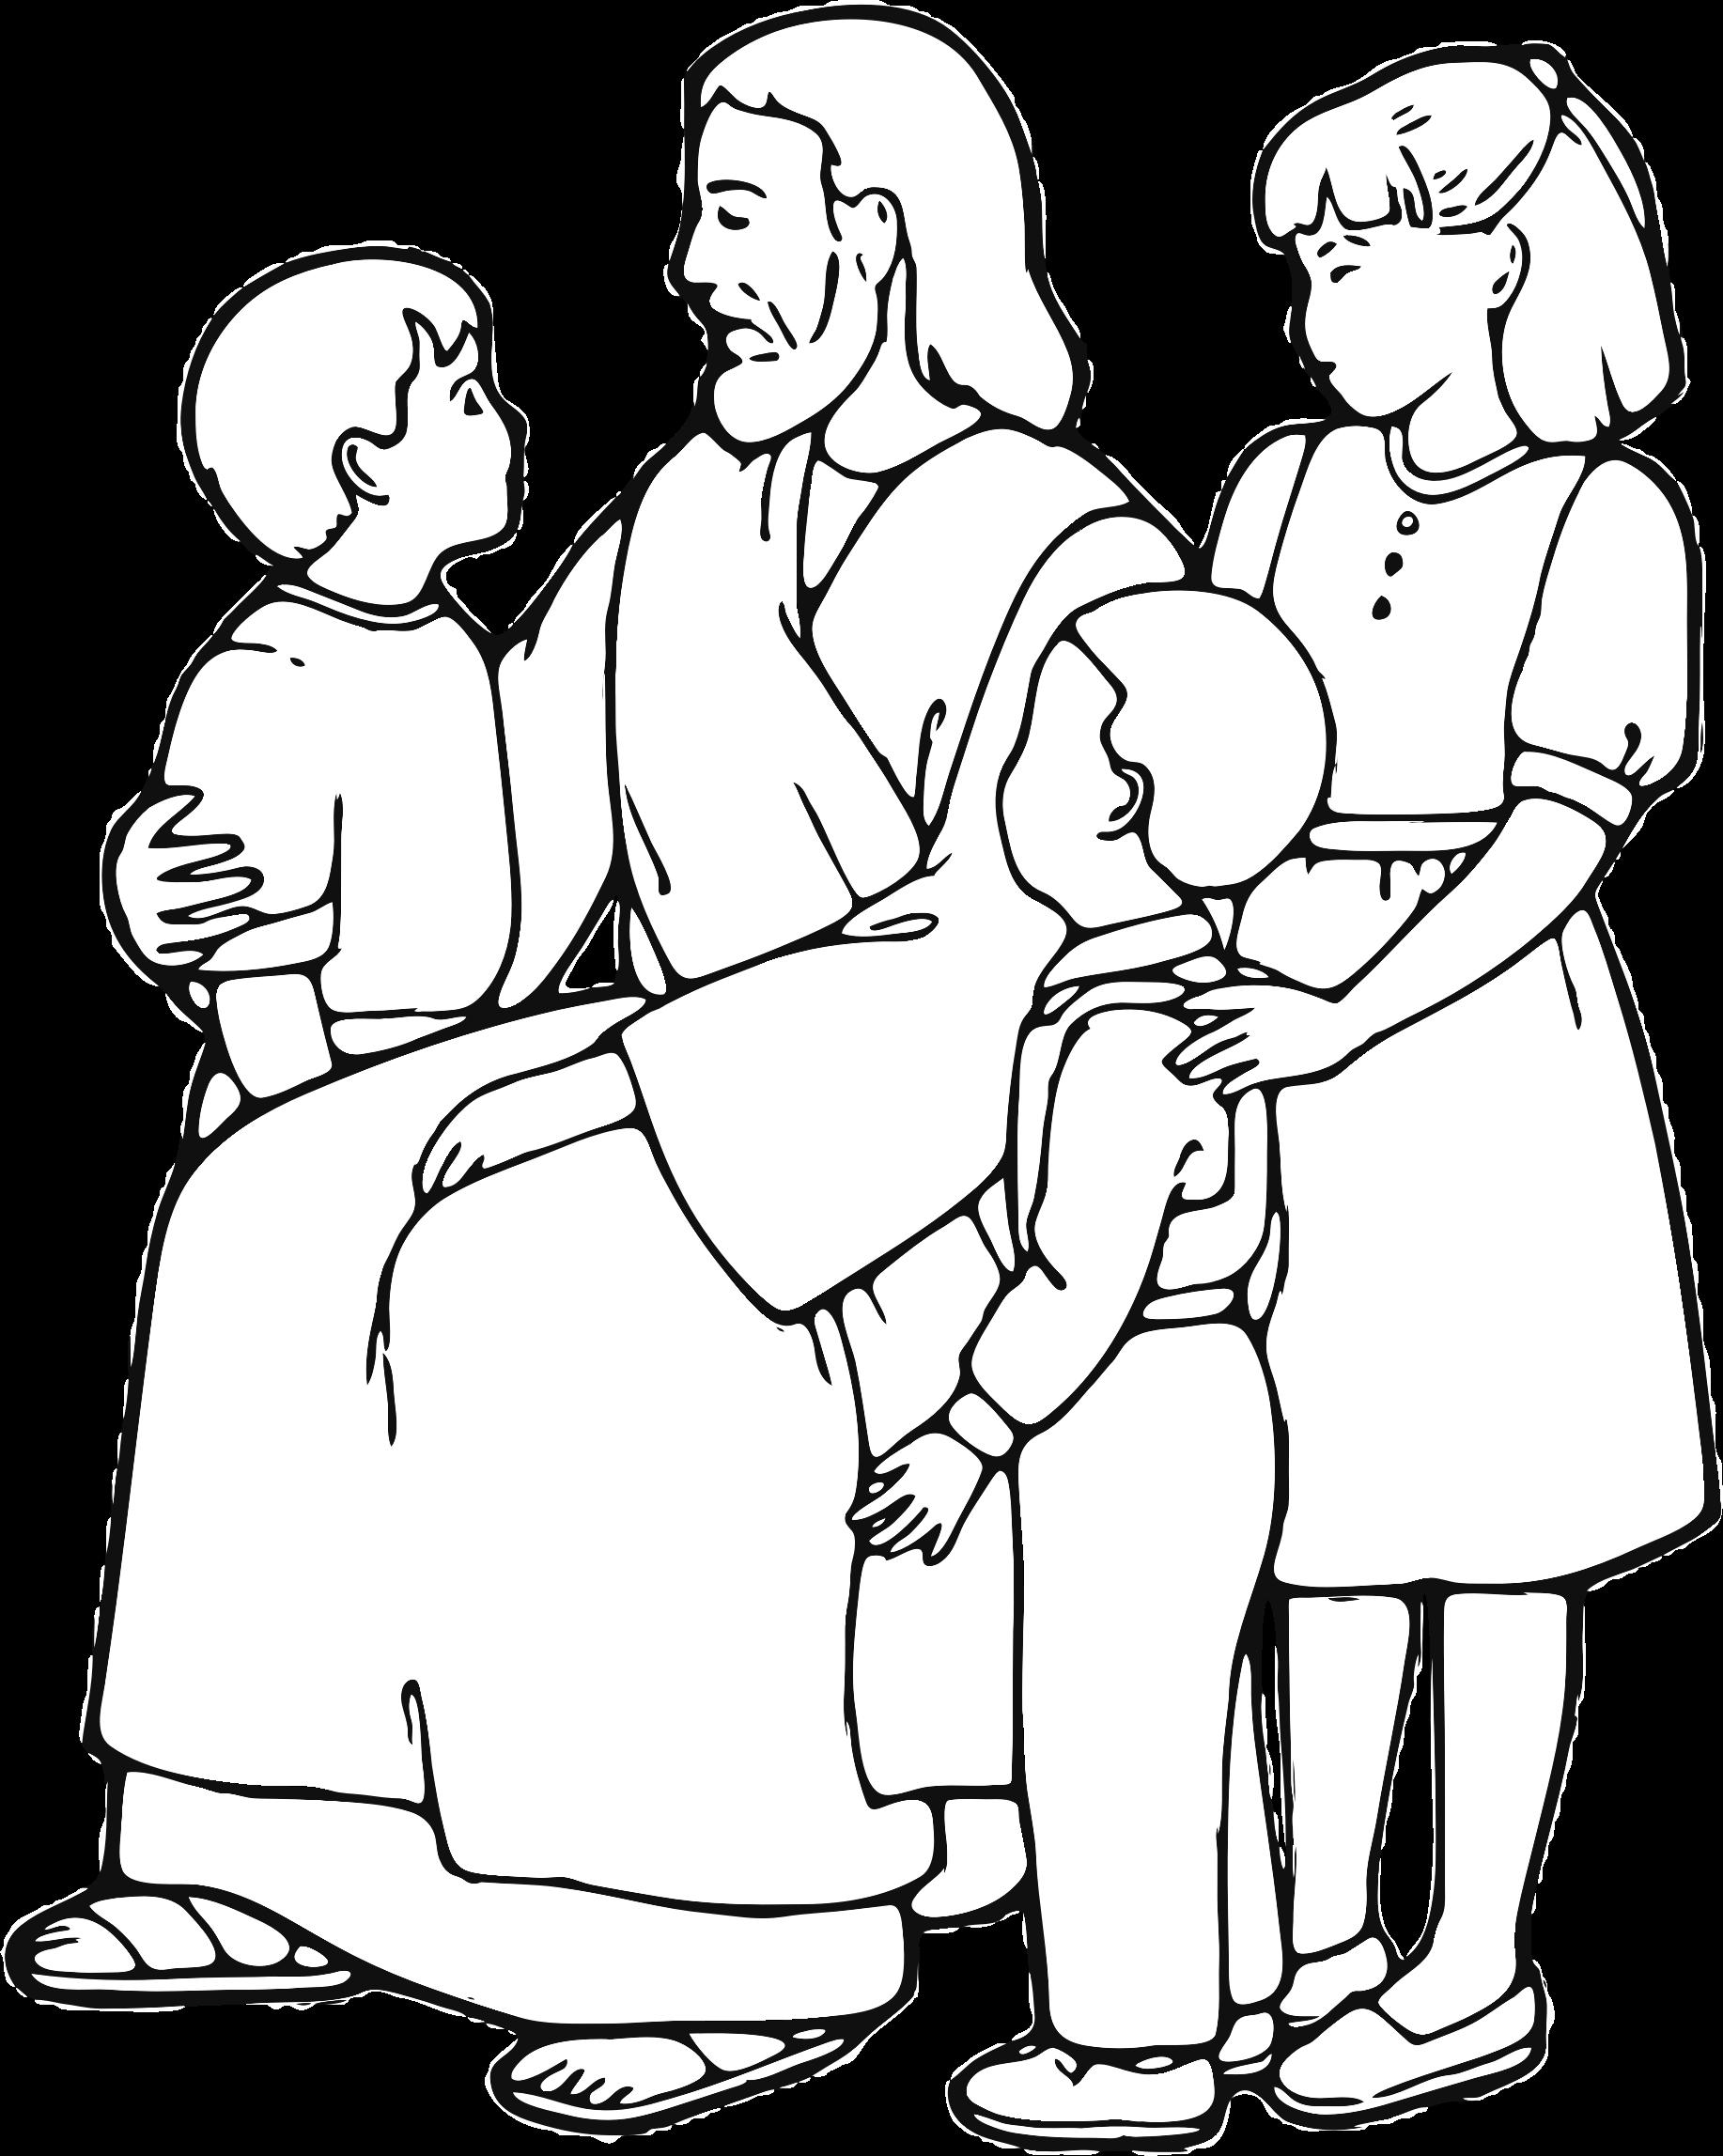 Pin by Joan Scheer on Sunday School | Pinterest | Jesus teachings ...